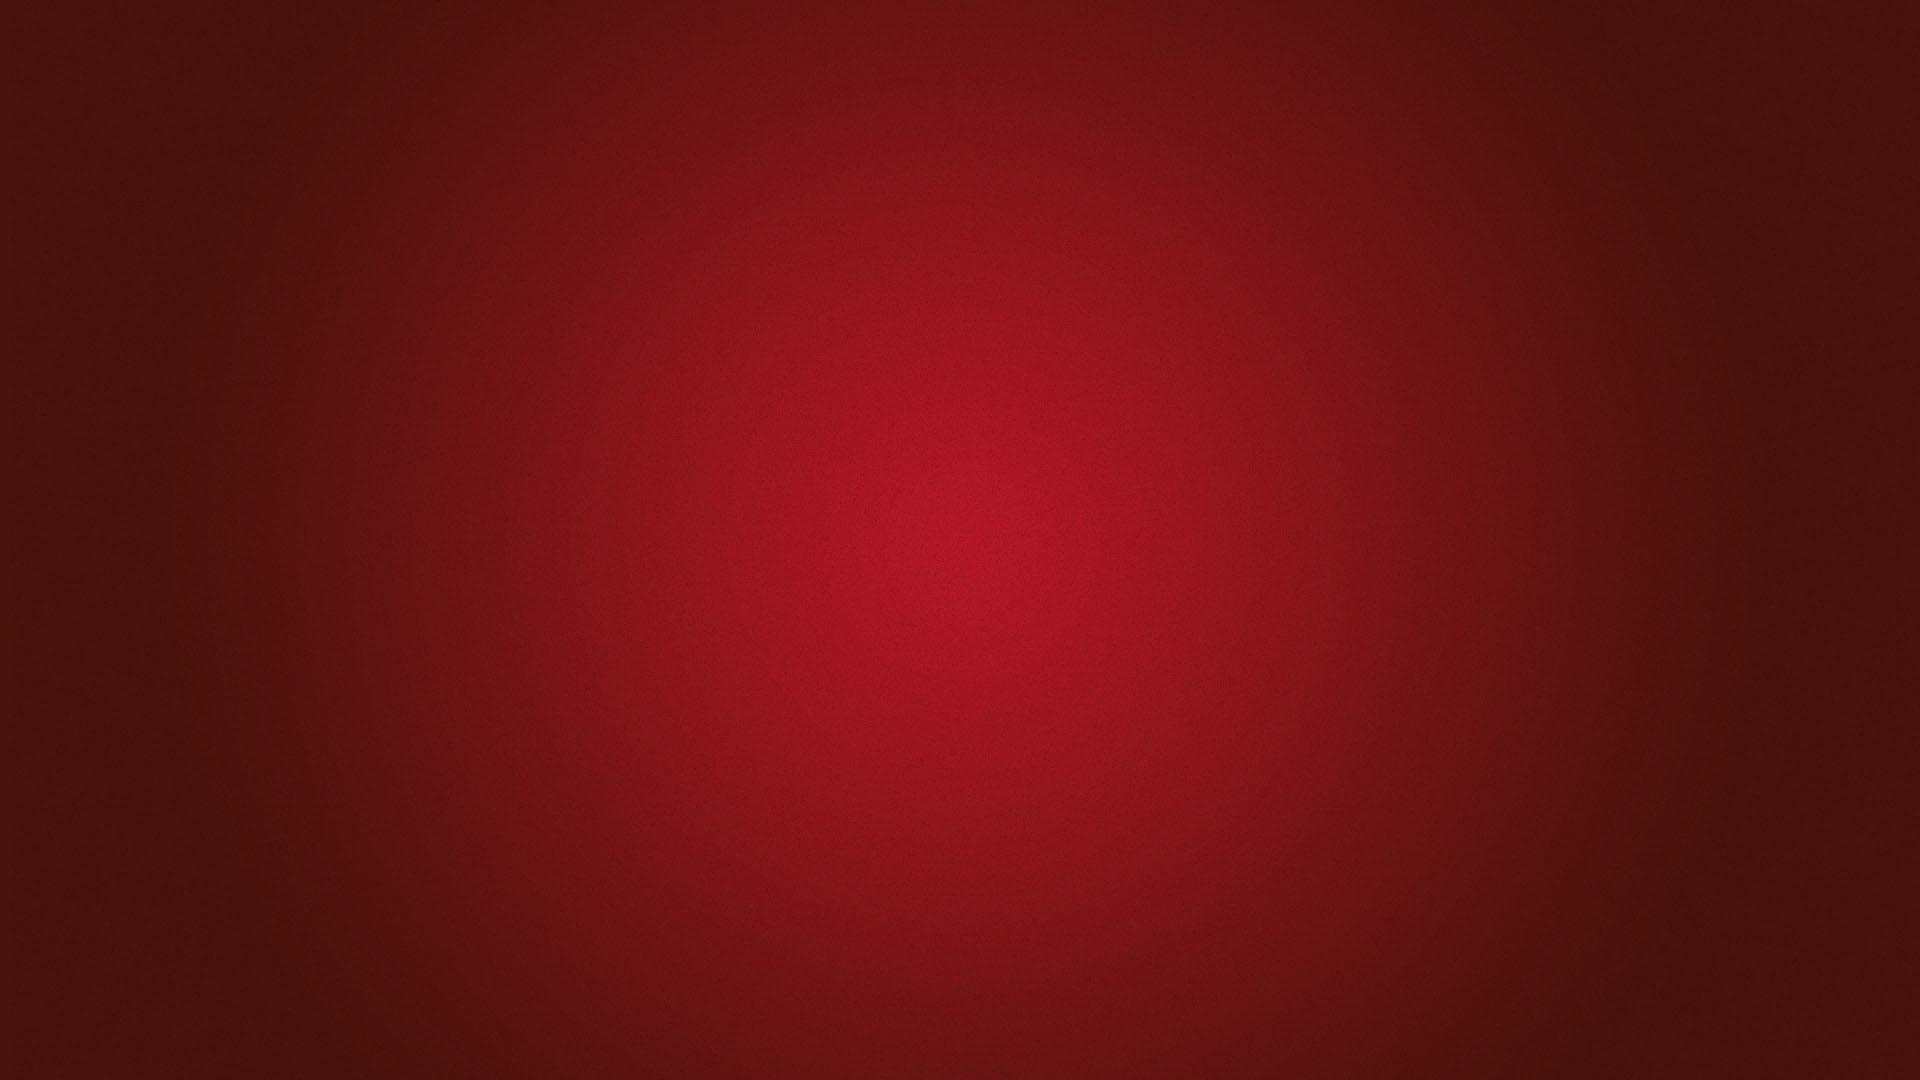 Sfondo_rosso